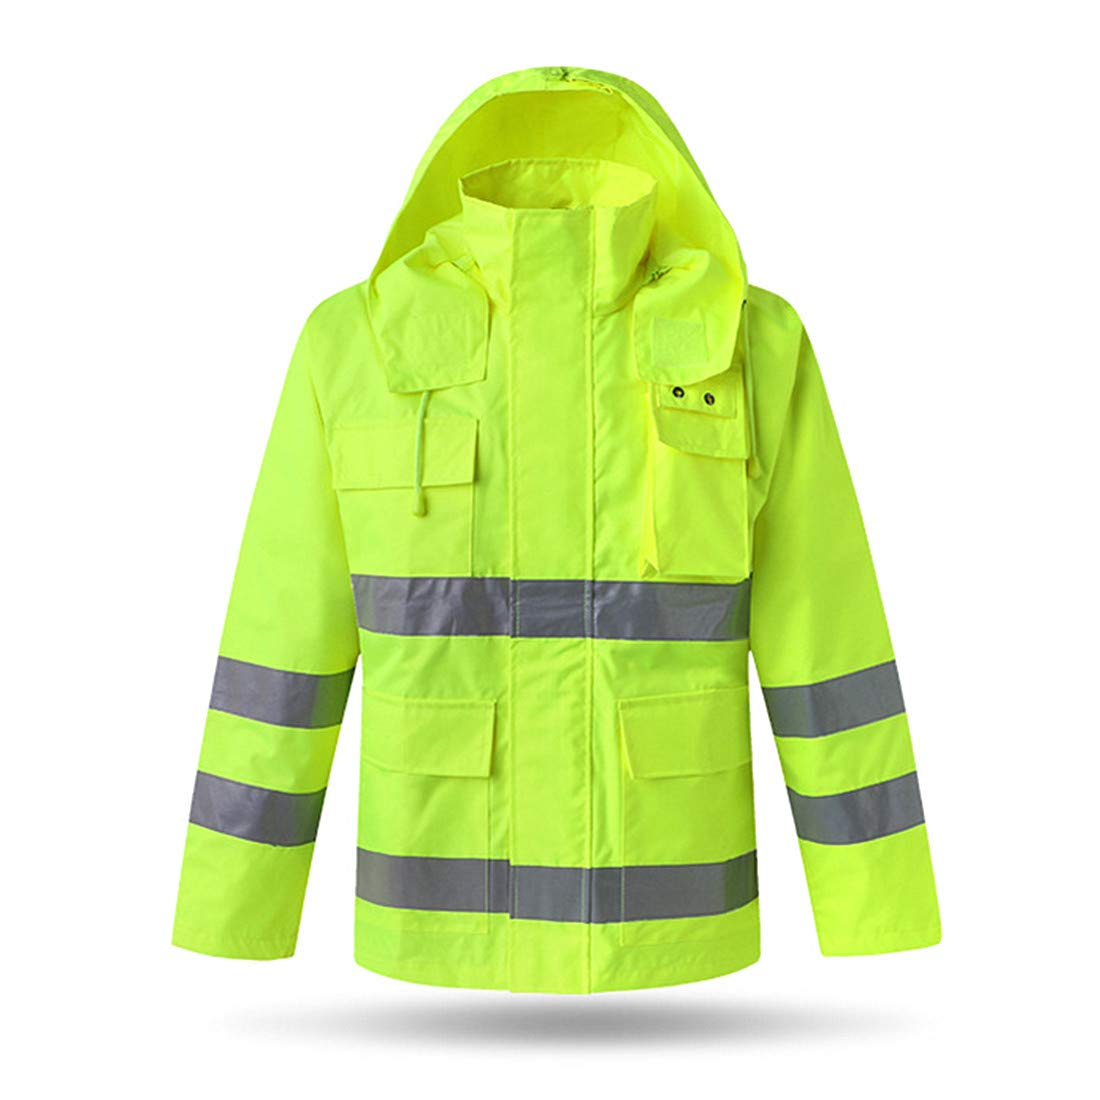 XIAKE SAFETY Class 3 Hi-Vis Reflective Rainwear Breathable Windproof Waterproof Antifouling, ANSI/ISEA Compliant,Yellow (2X-Large)